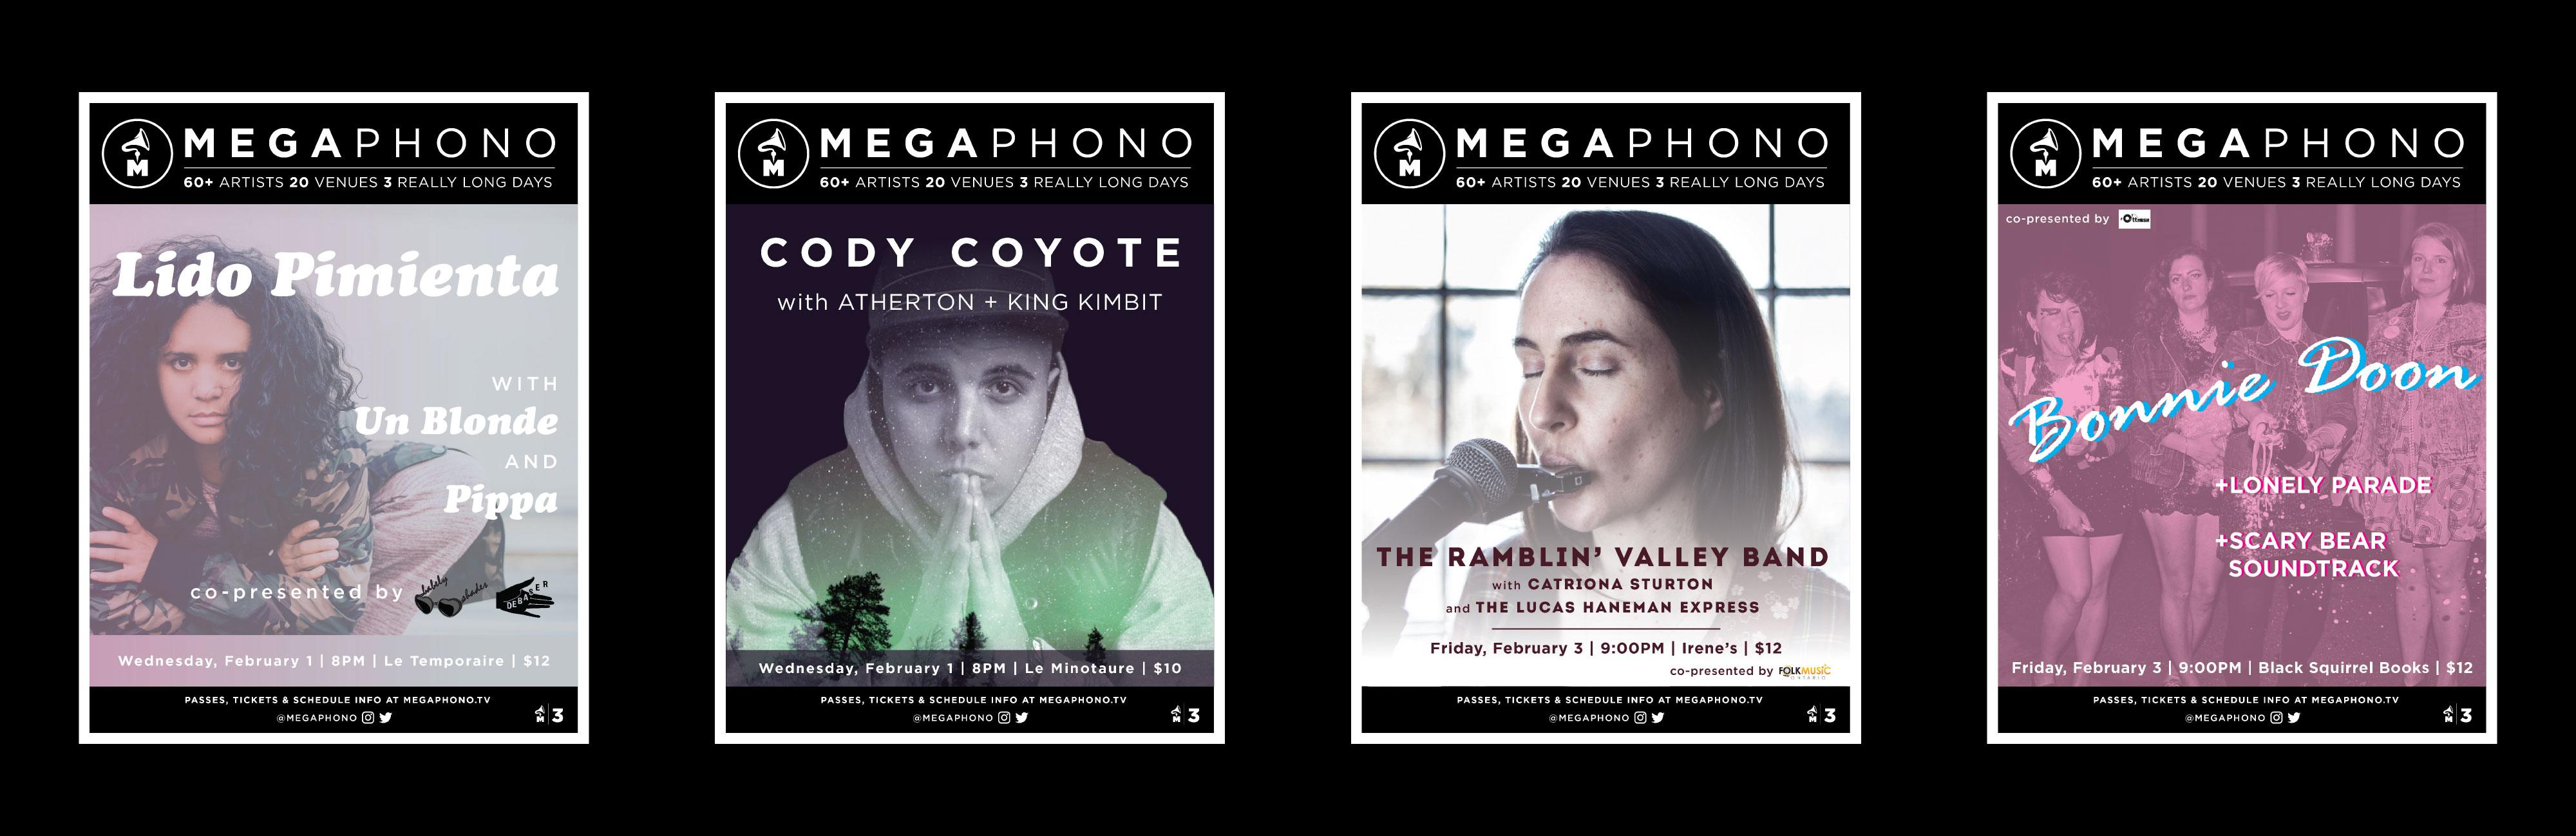 megaphono-posters-03